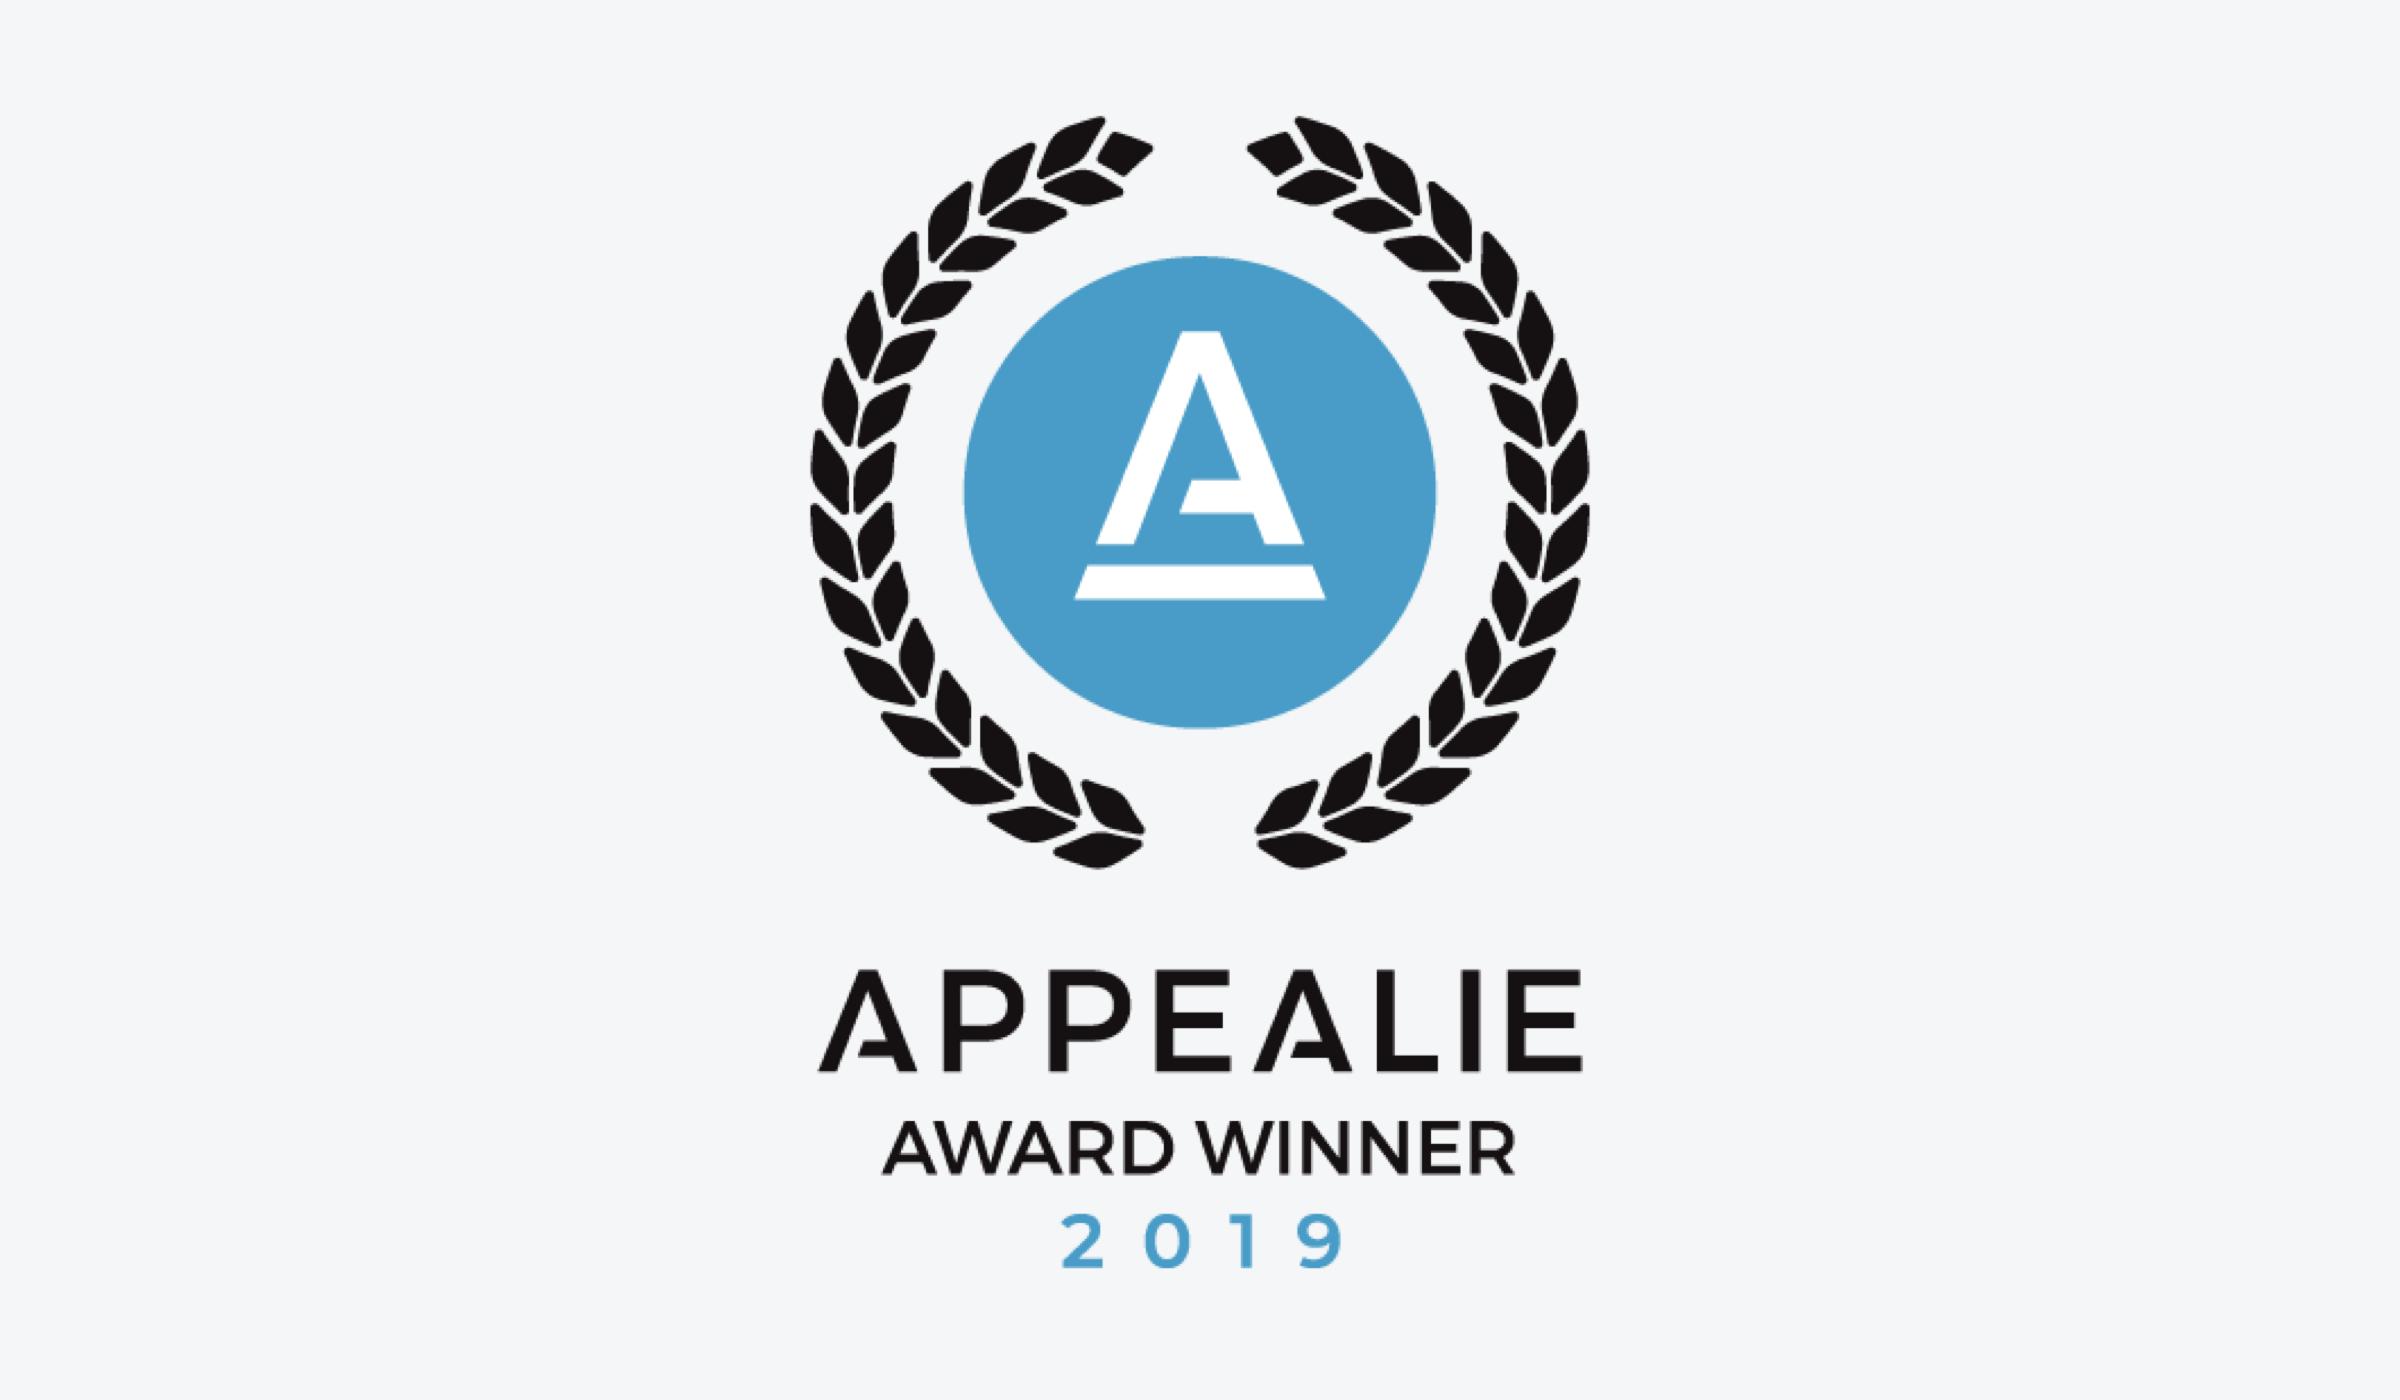 Online Reputation Management Leader Birdeye Wins 2019 Overall Saas Award 1573781794446